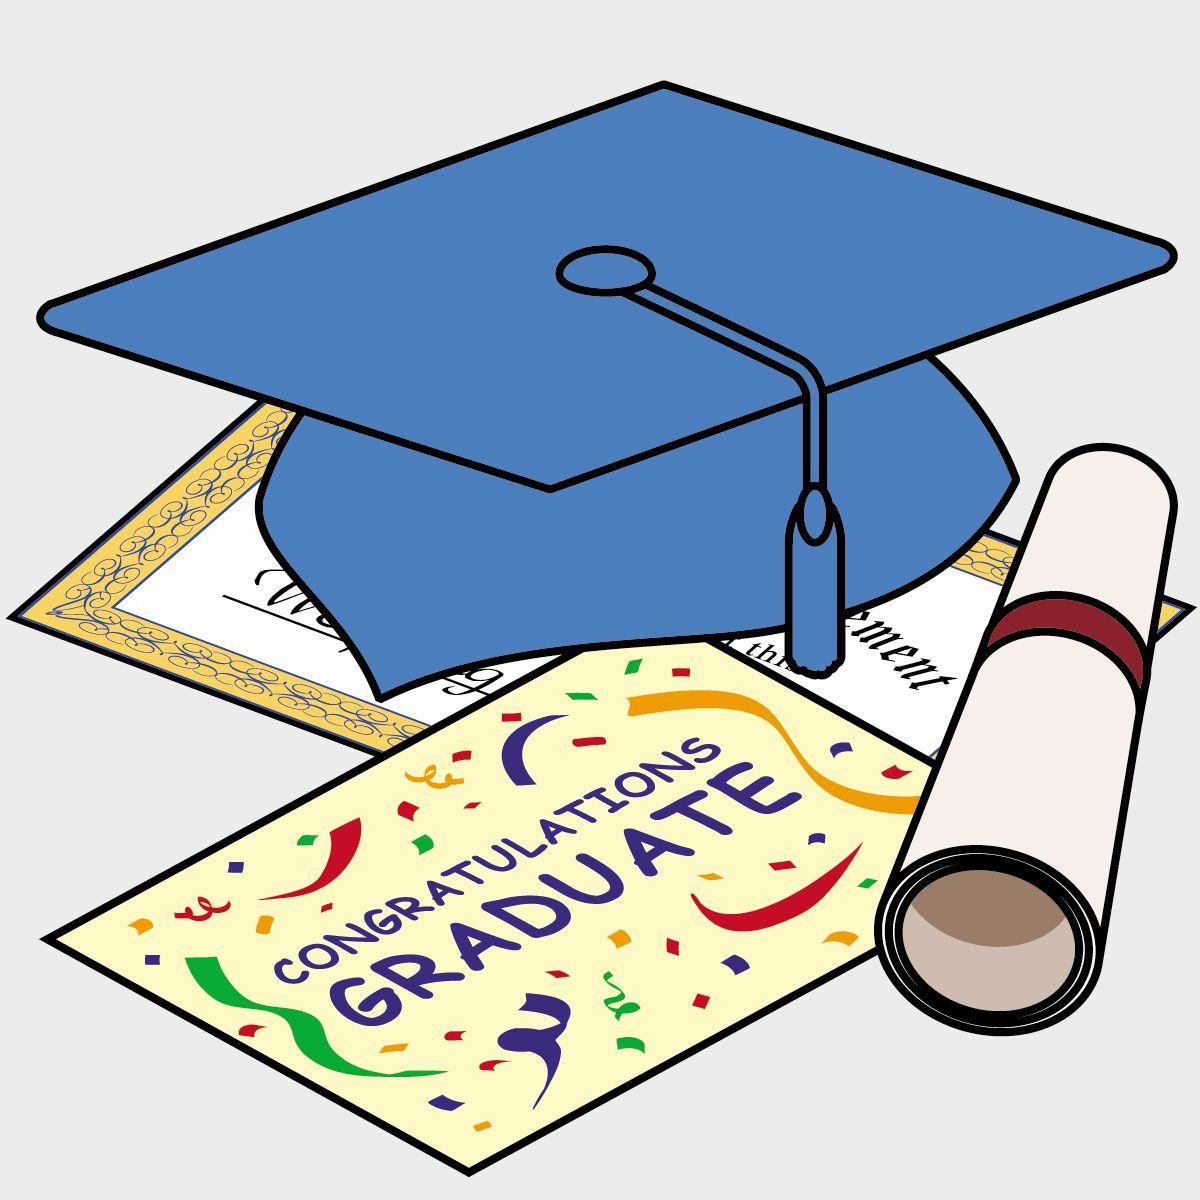 827 Free Free Graduation Clip Art Images - Graduation Clip Art Free Printable